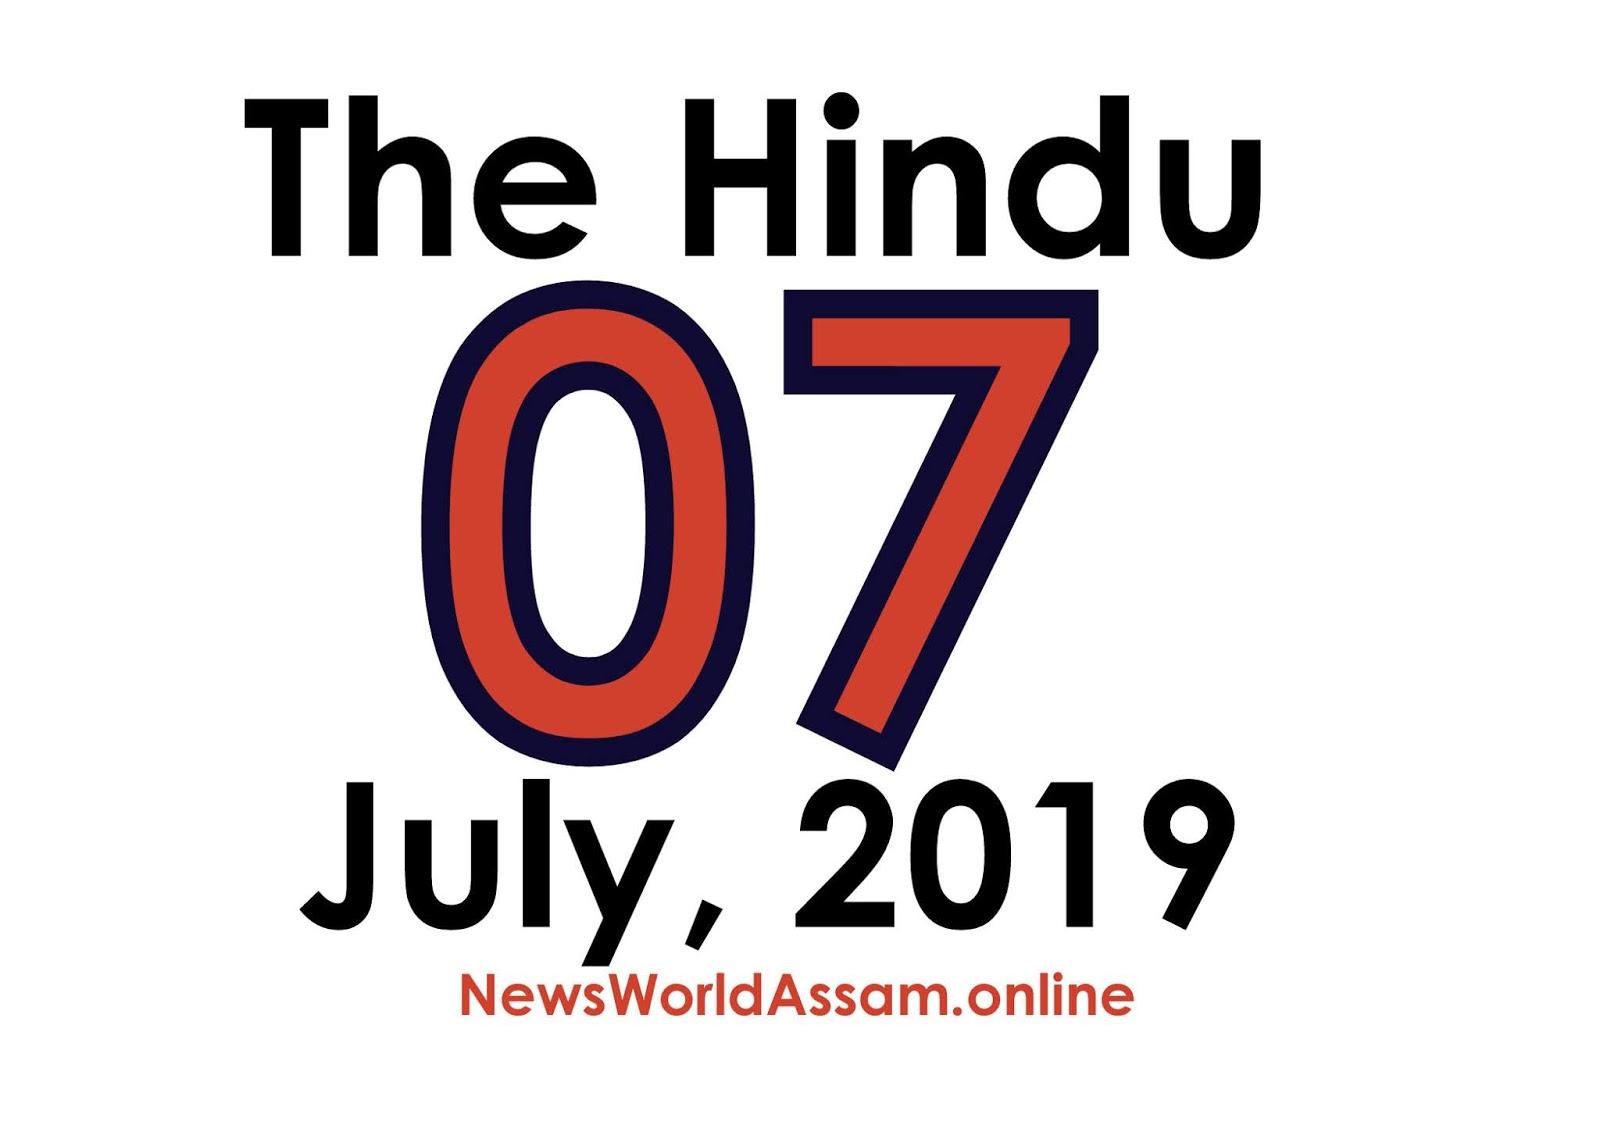 The Hindu 07 July, 19 PDF Download - News World Assam